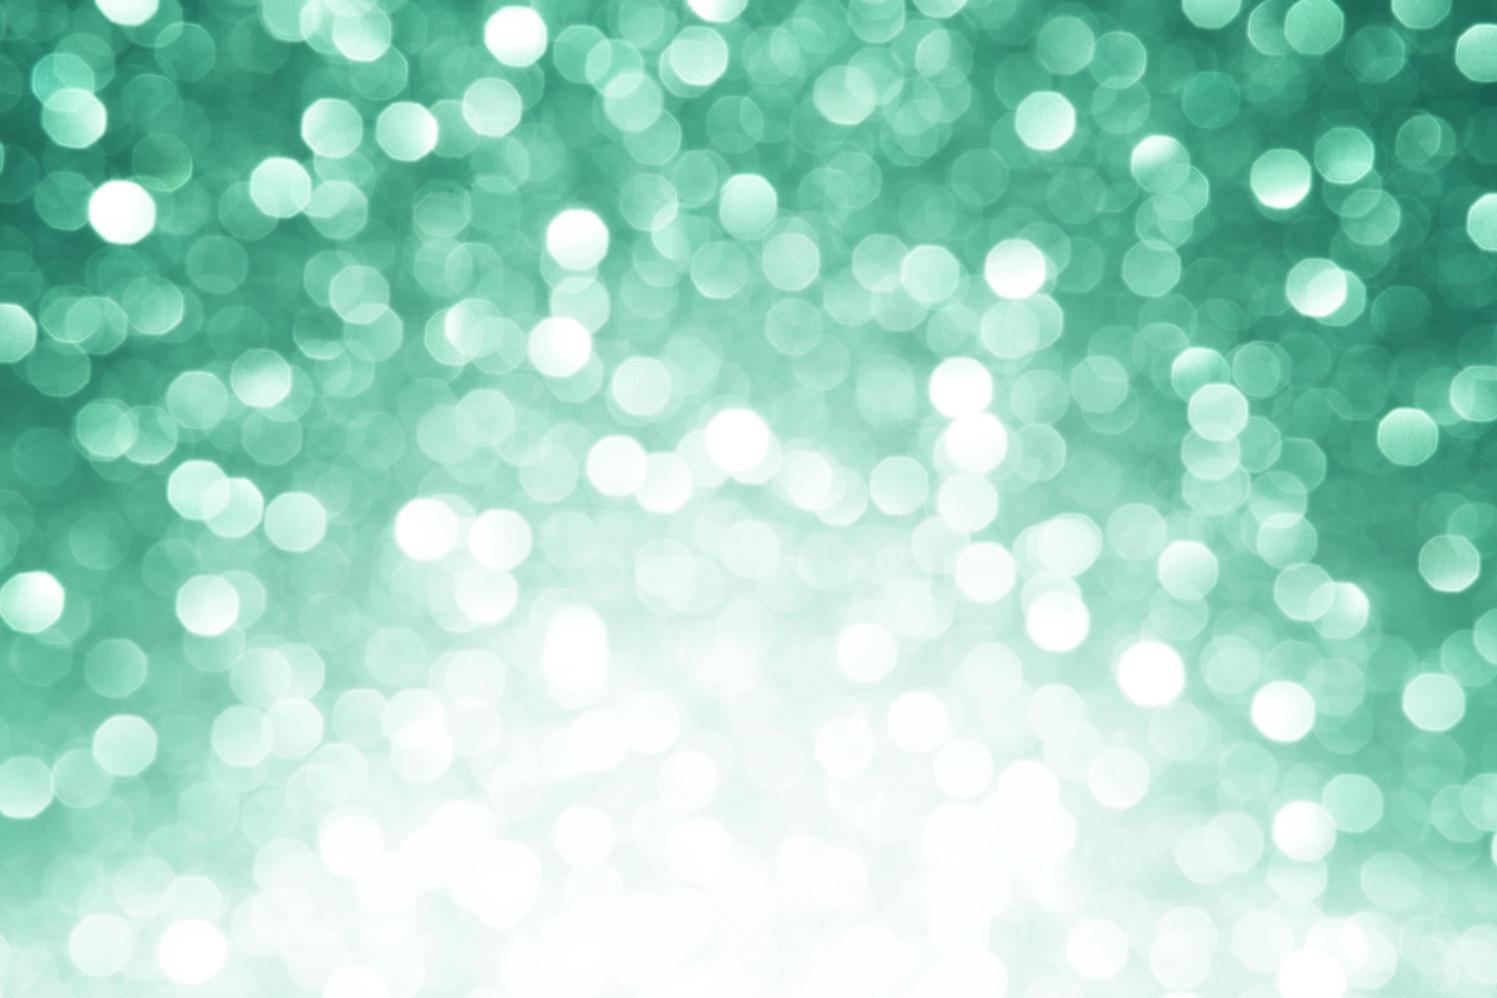 Vert froid